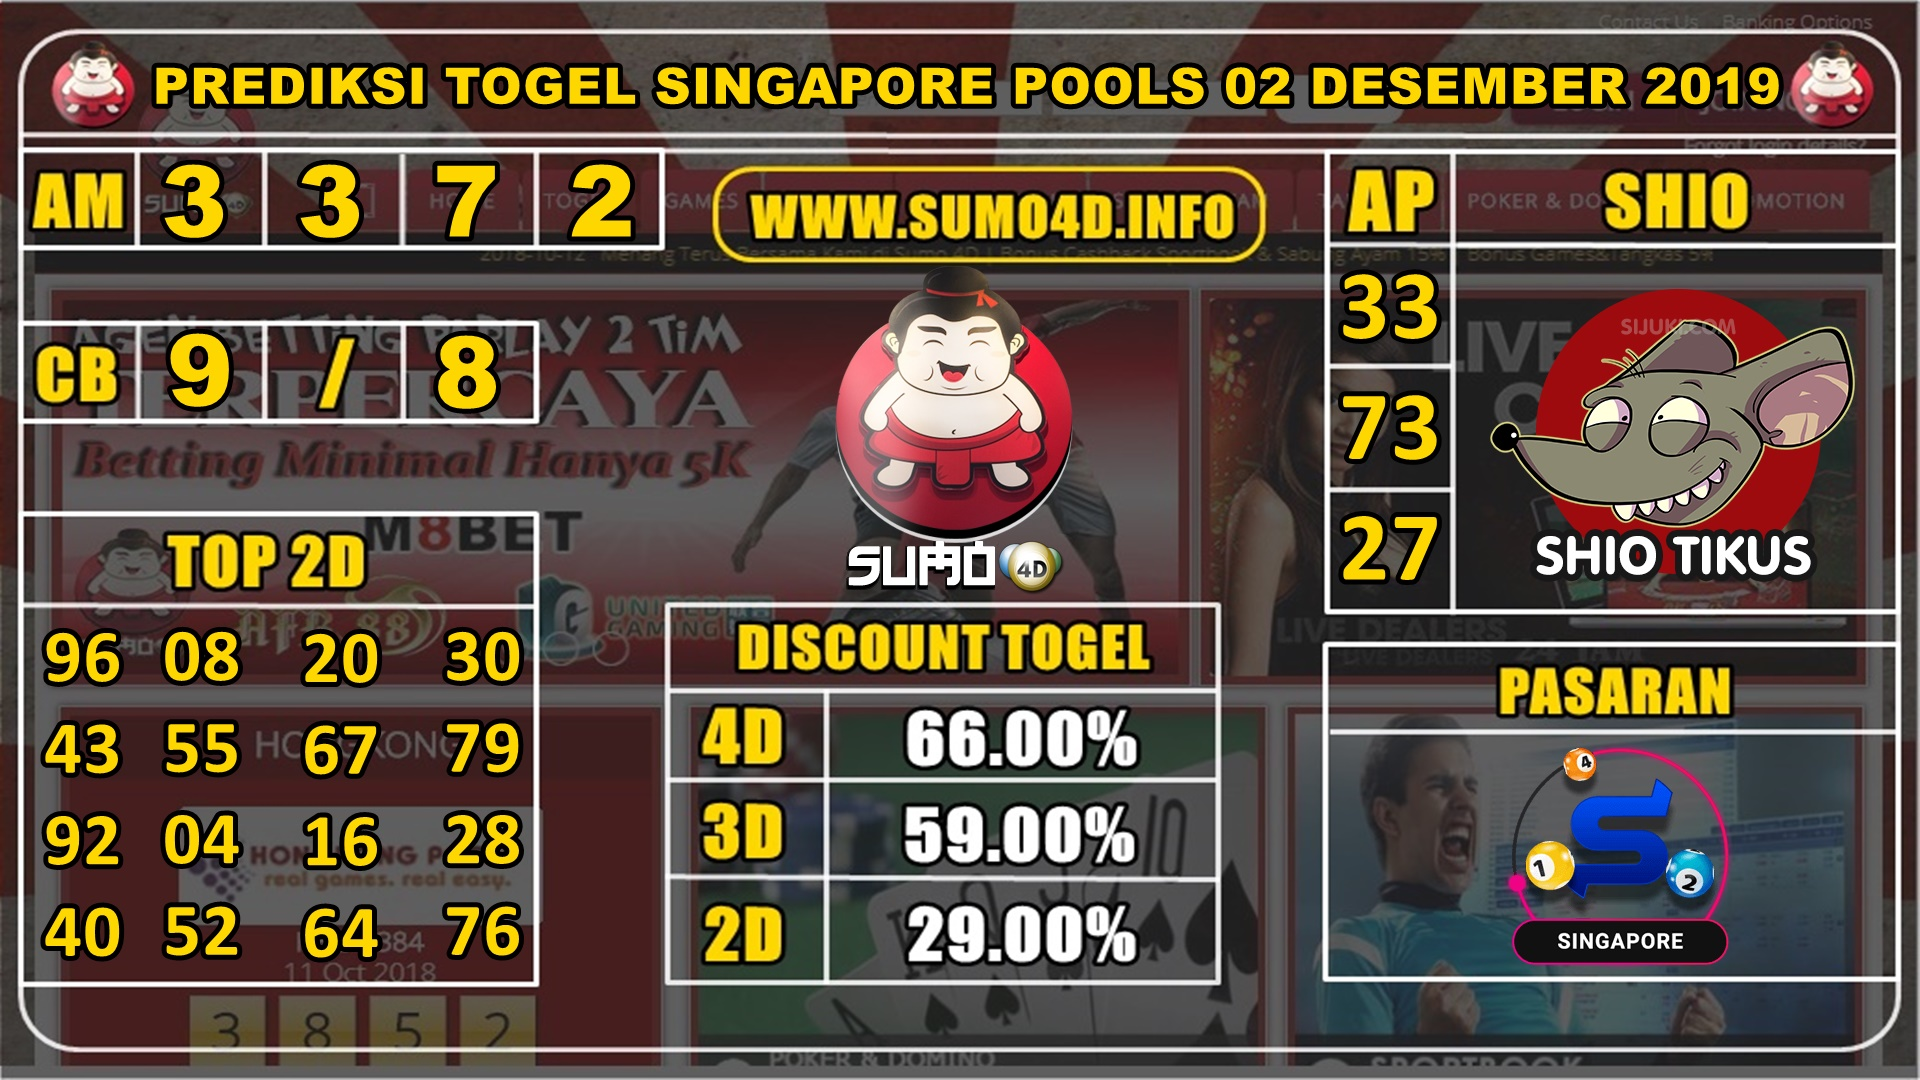 PREDIKSI TOGEL SINGAPORE POOLS 02 DESEMBER 2019